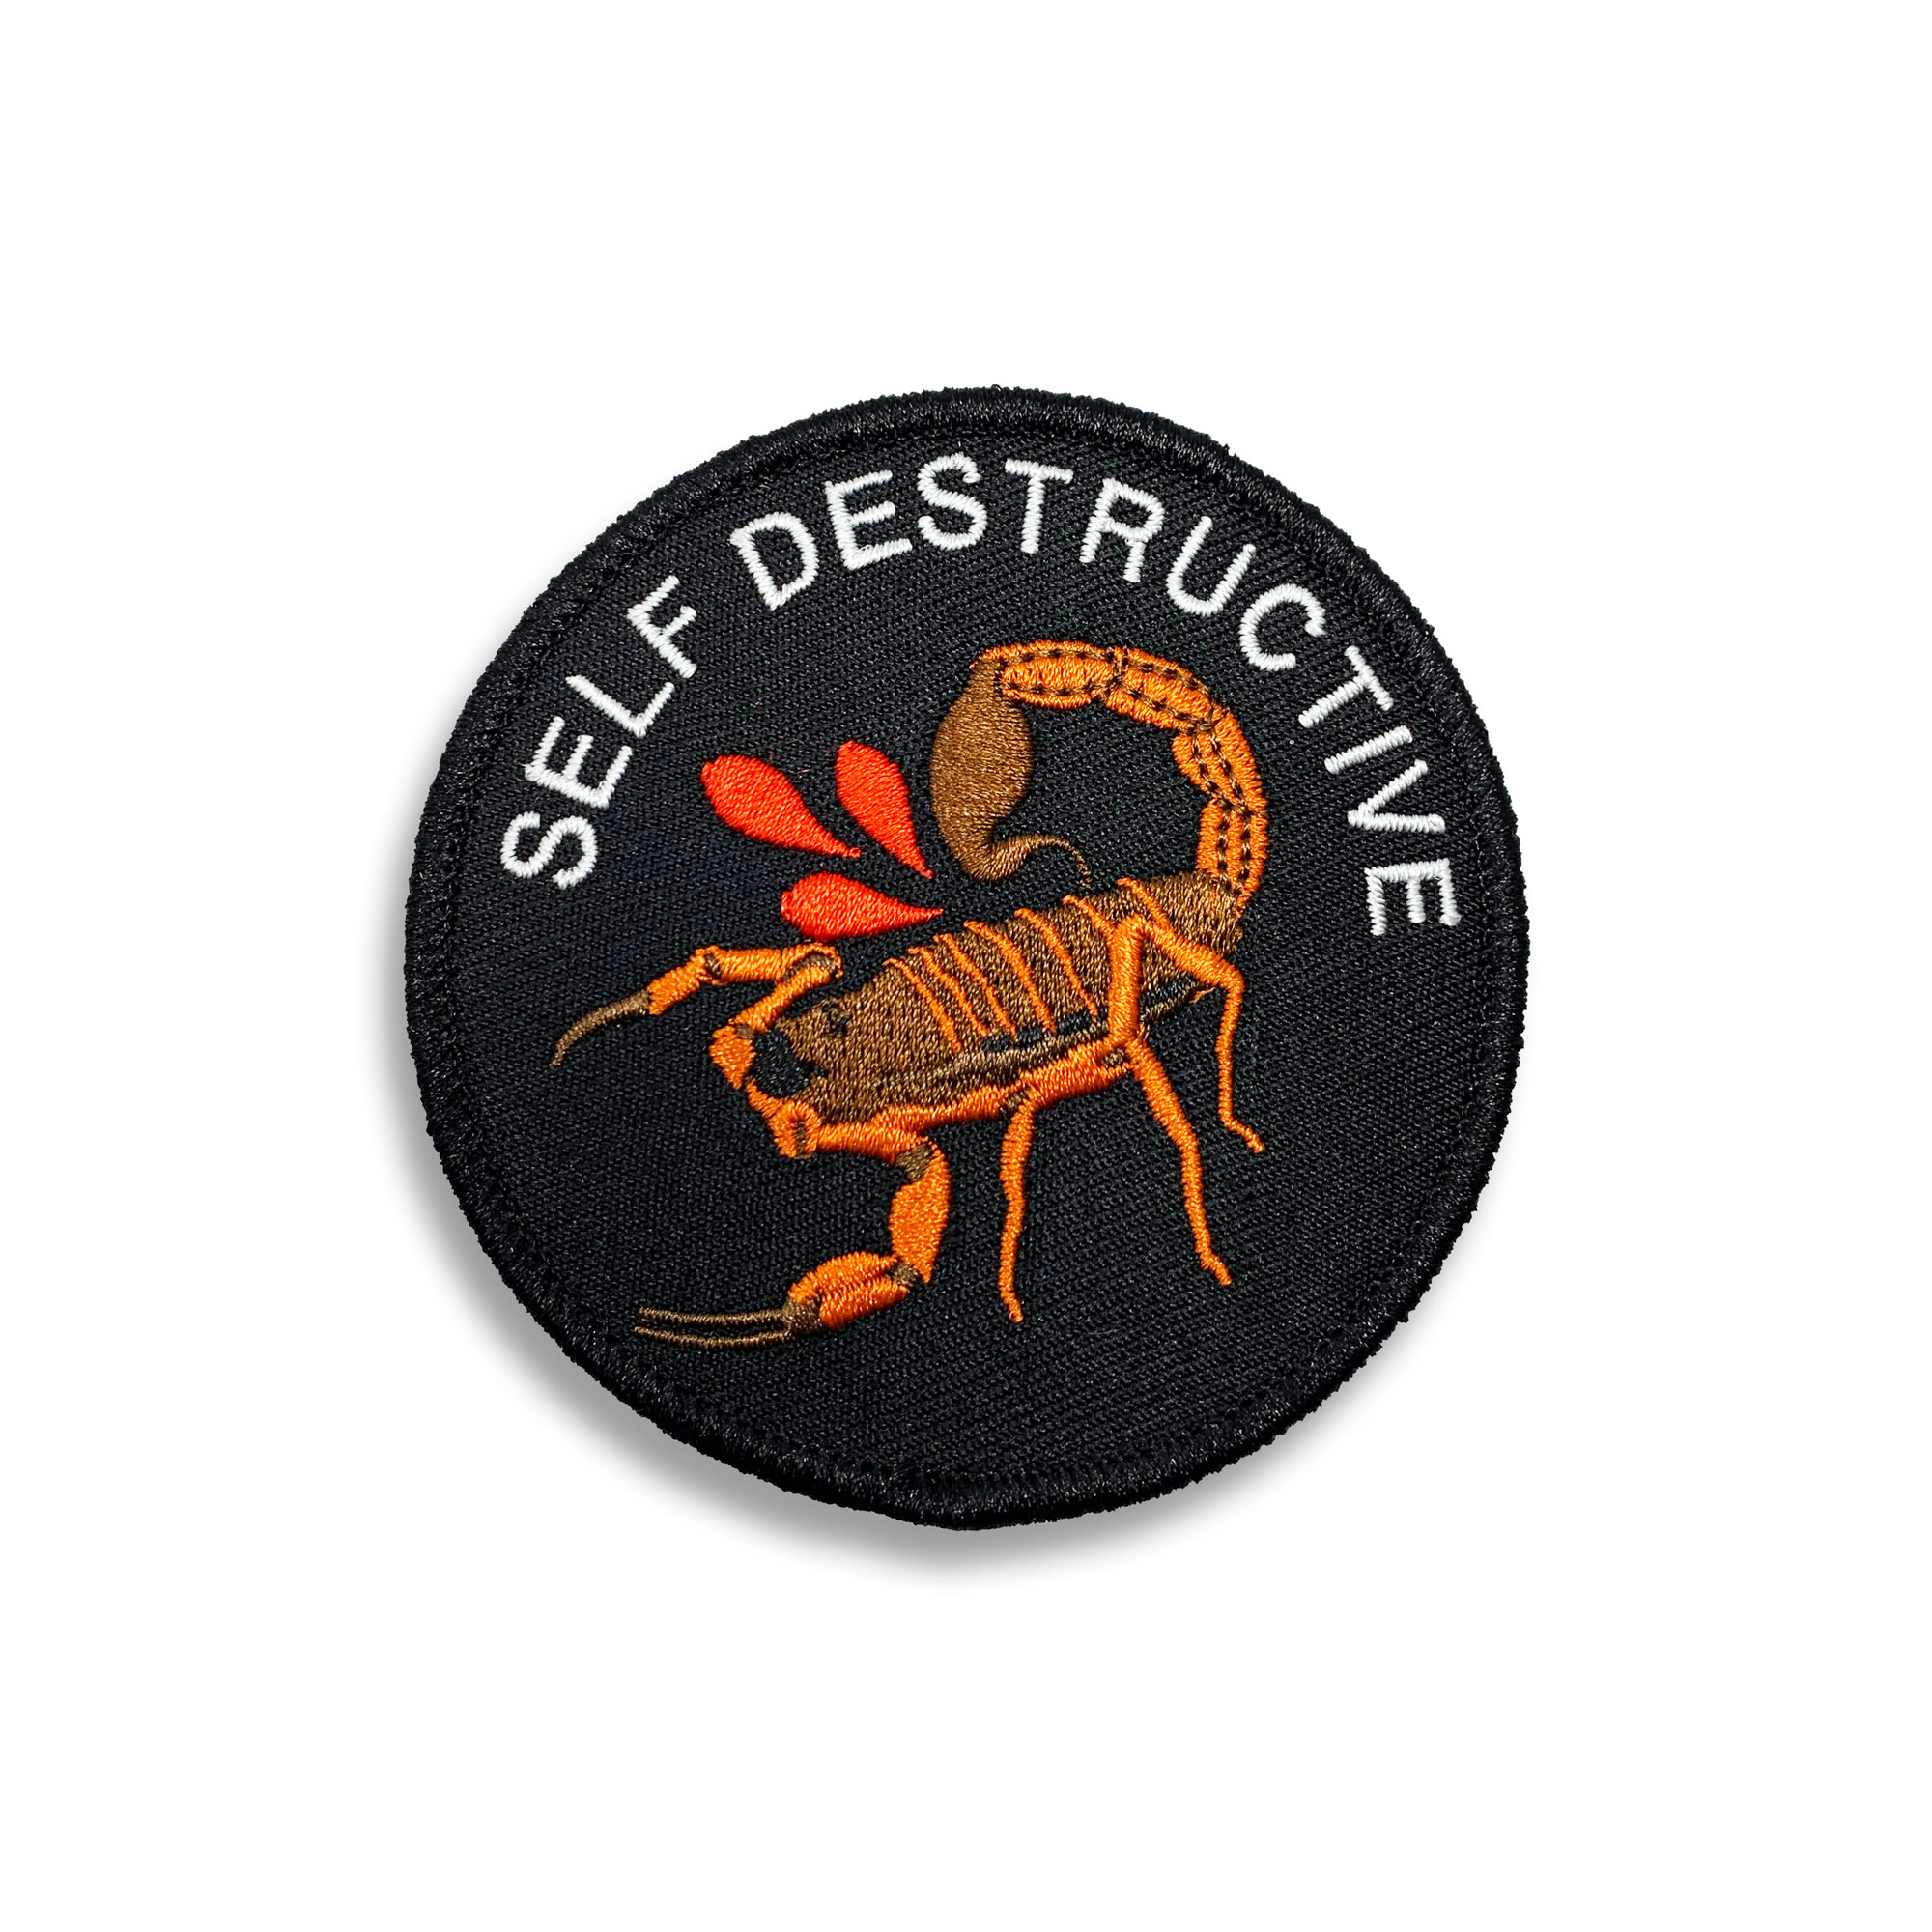 Patch - Self Destructive Scorpion at Bad Attitude Dept